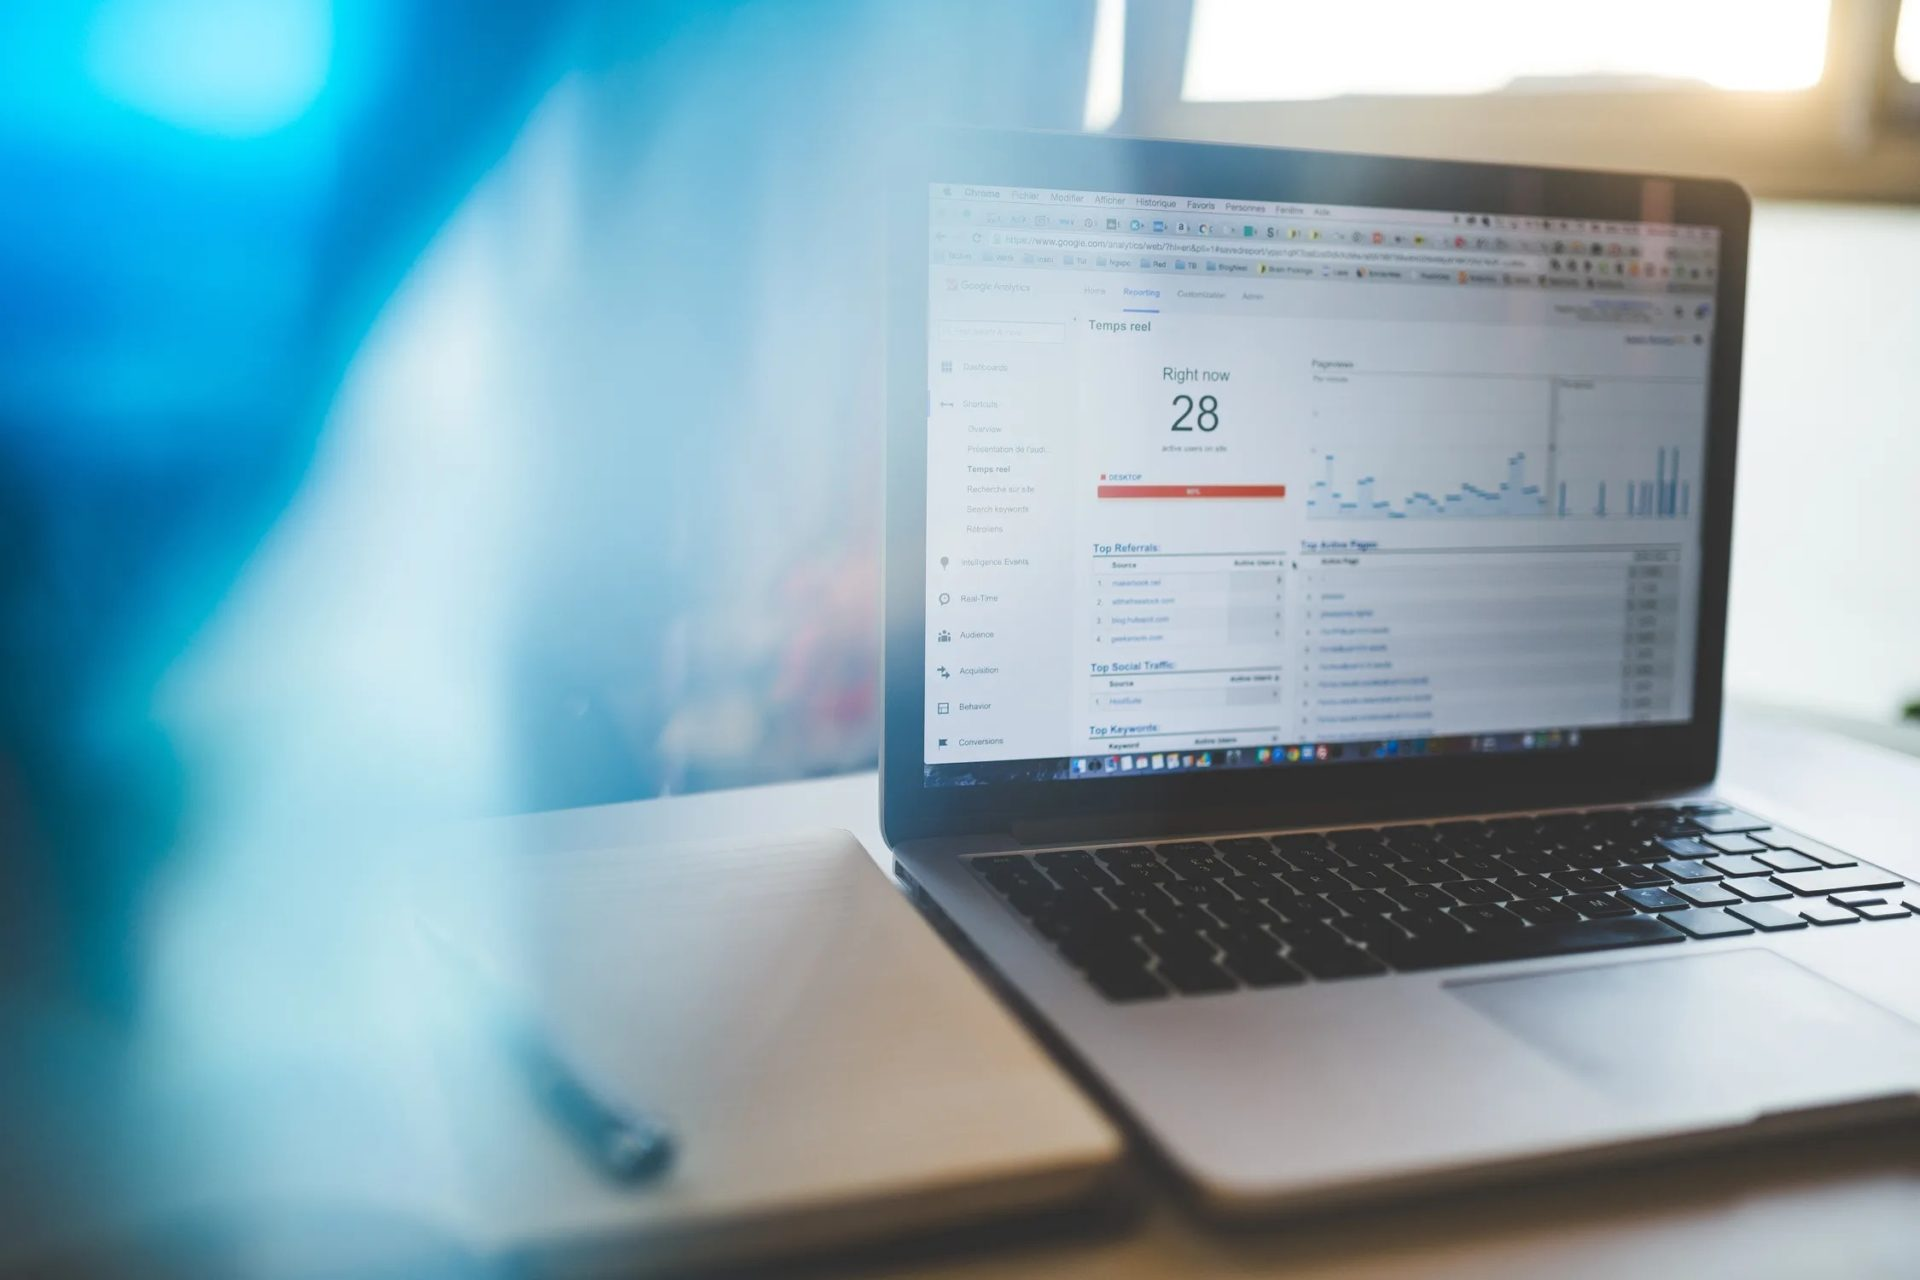 Laptop with Google Analytics open